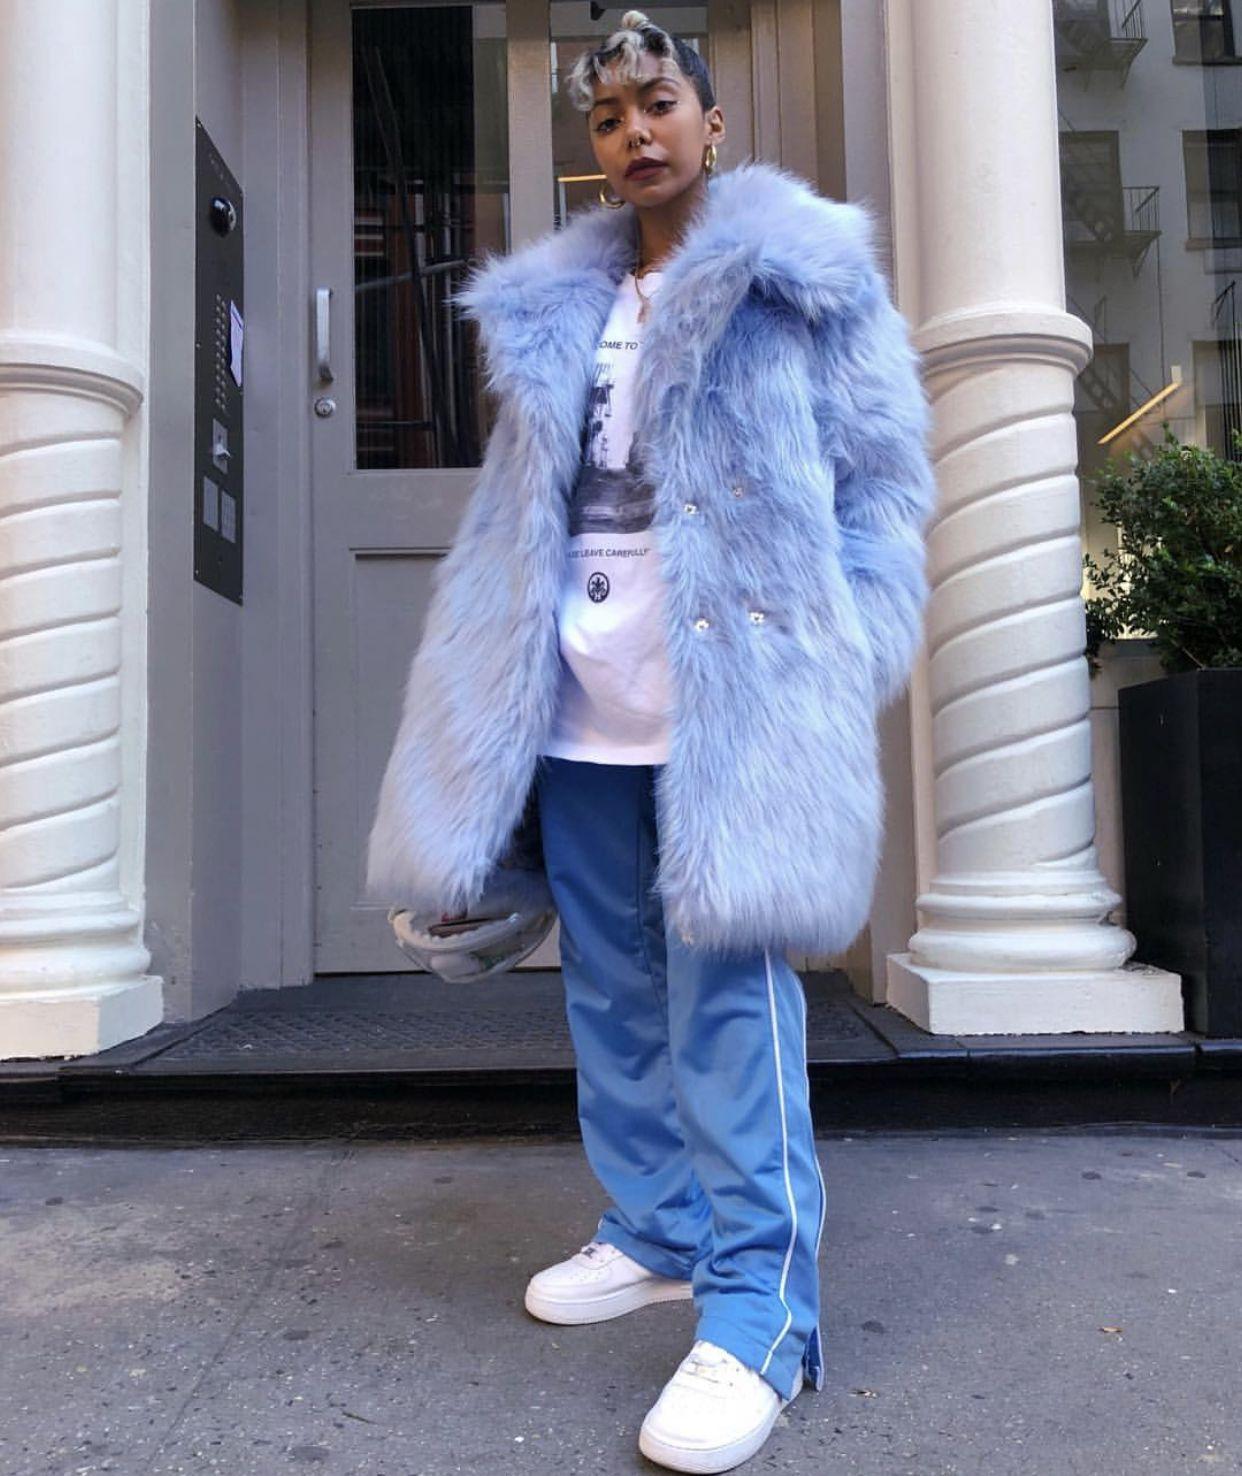 Light Blue Faux Fur Coat Wuzg00d Lookbook Outfits High Fashion Street Style Harajuku Fashion